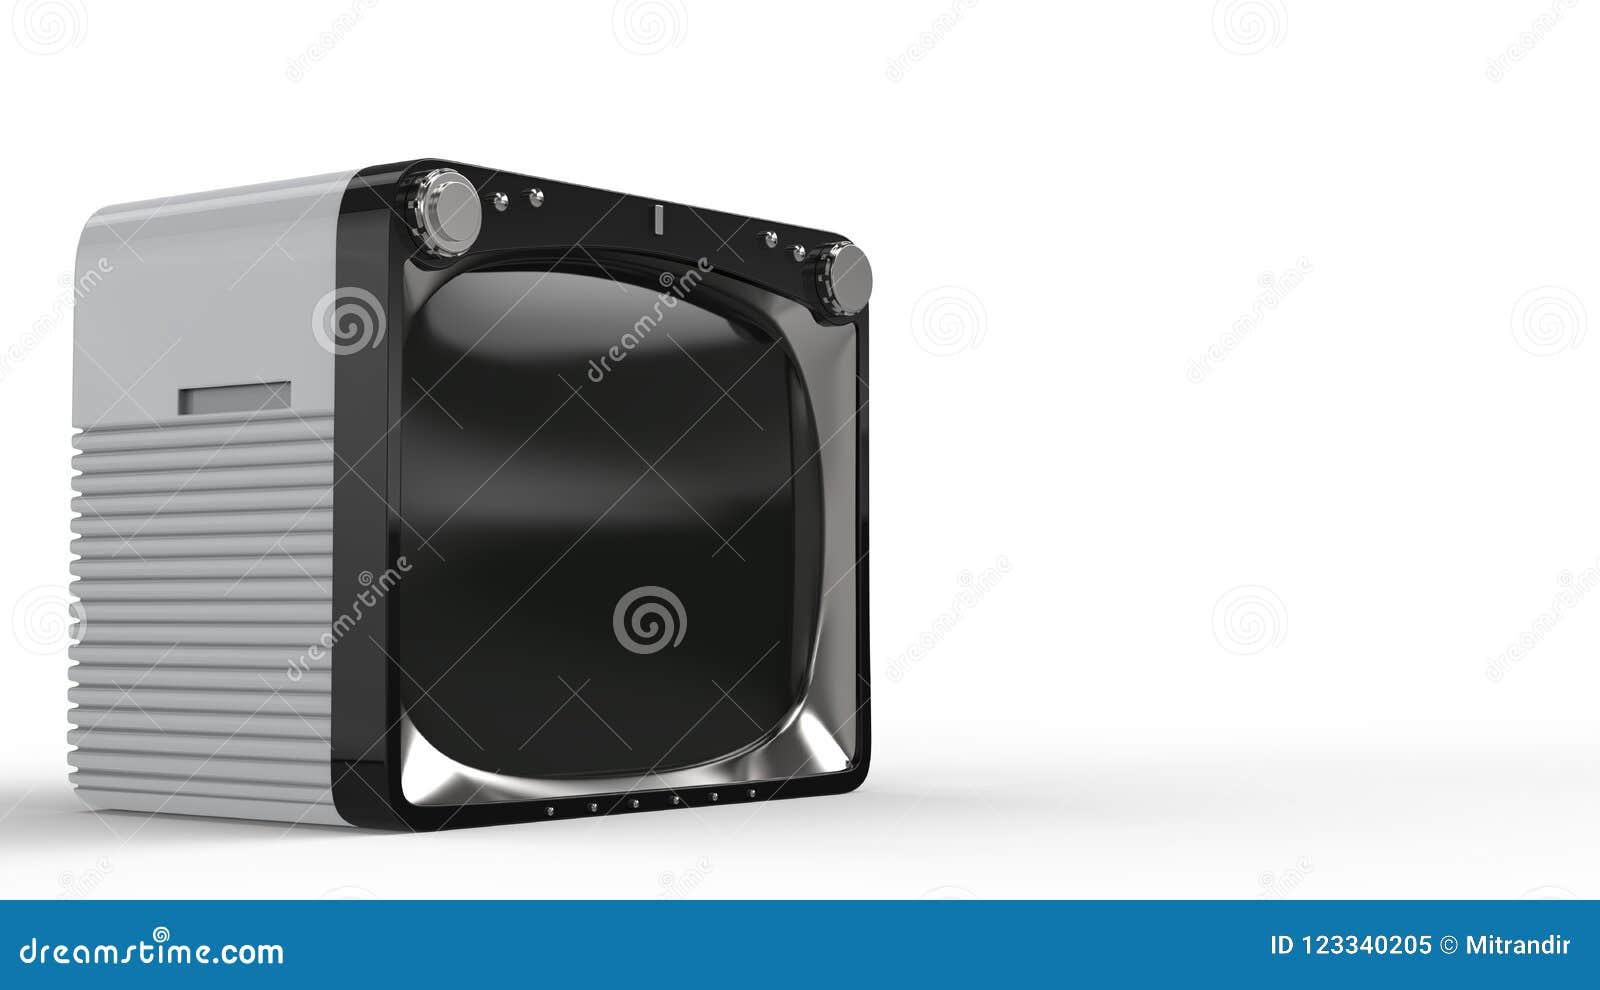 Vintage white TV set with black front